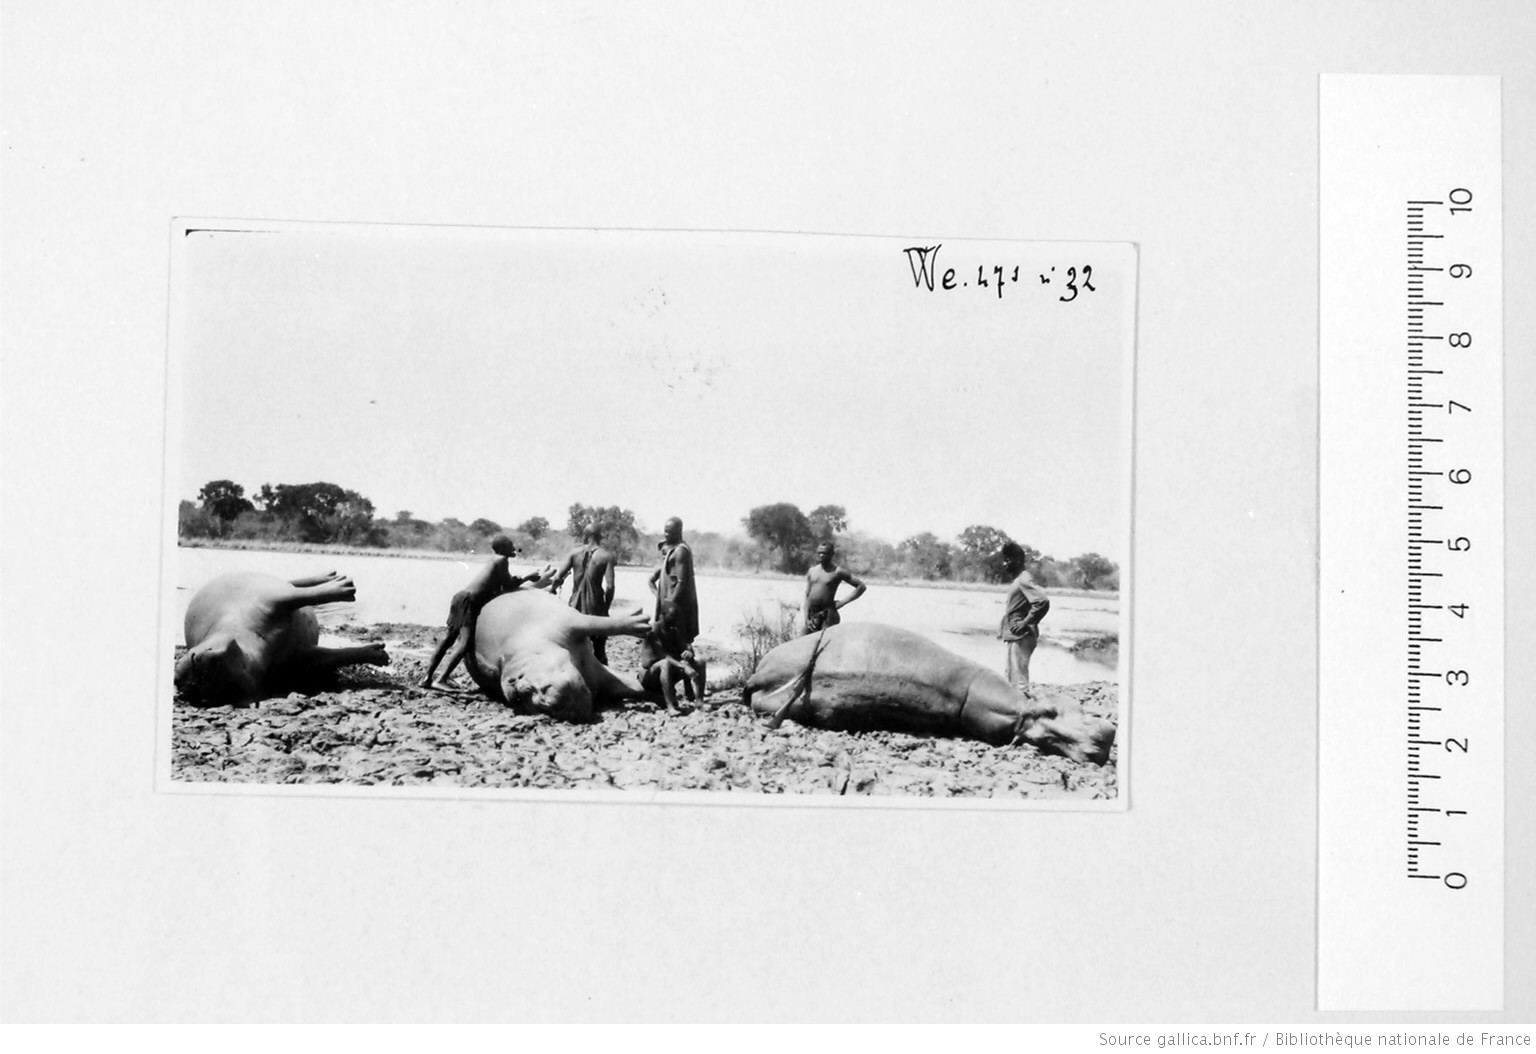 [39 phot. d'A.E.F. en 1924. Enregistré en 1936] - 30